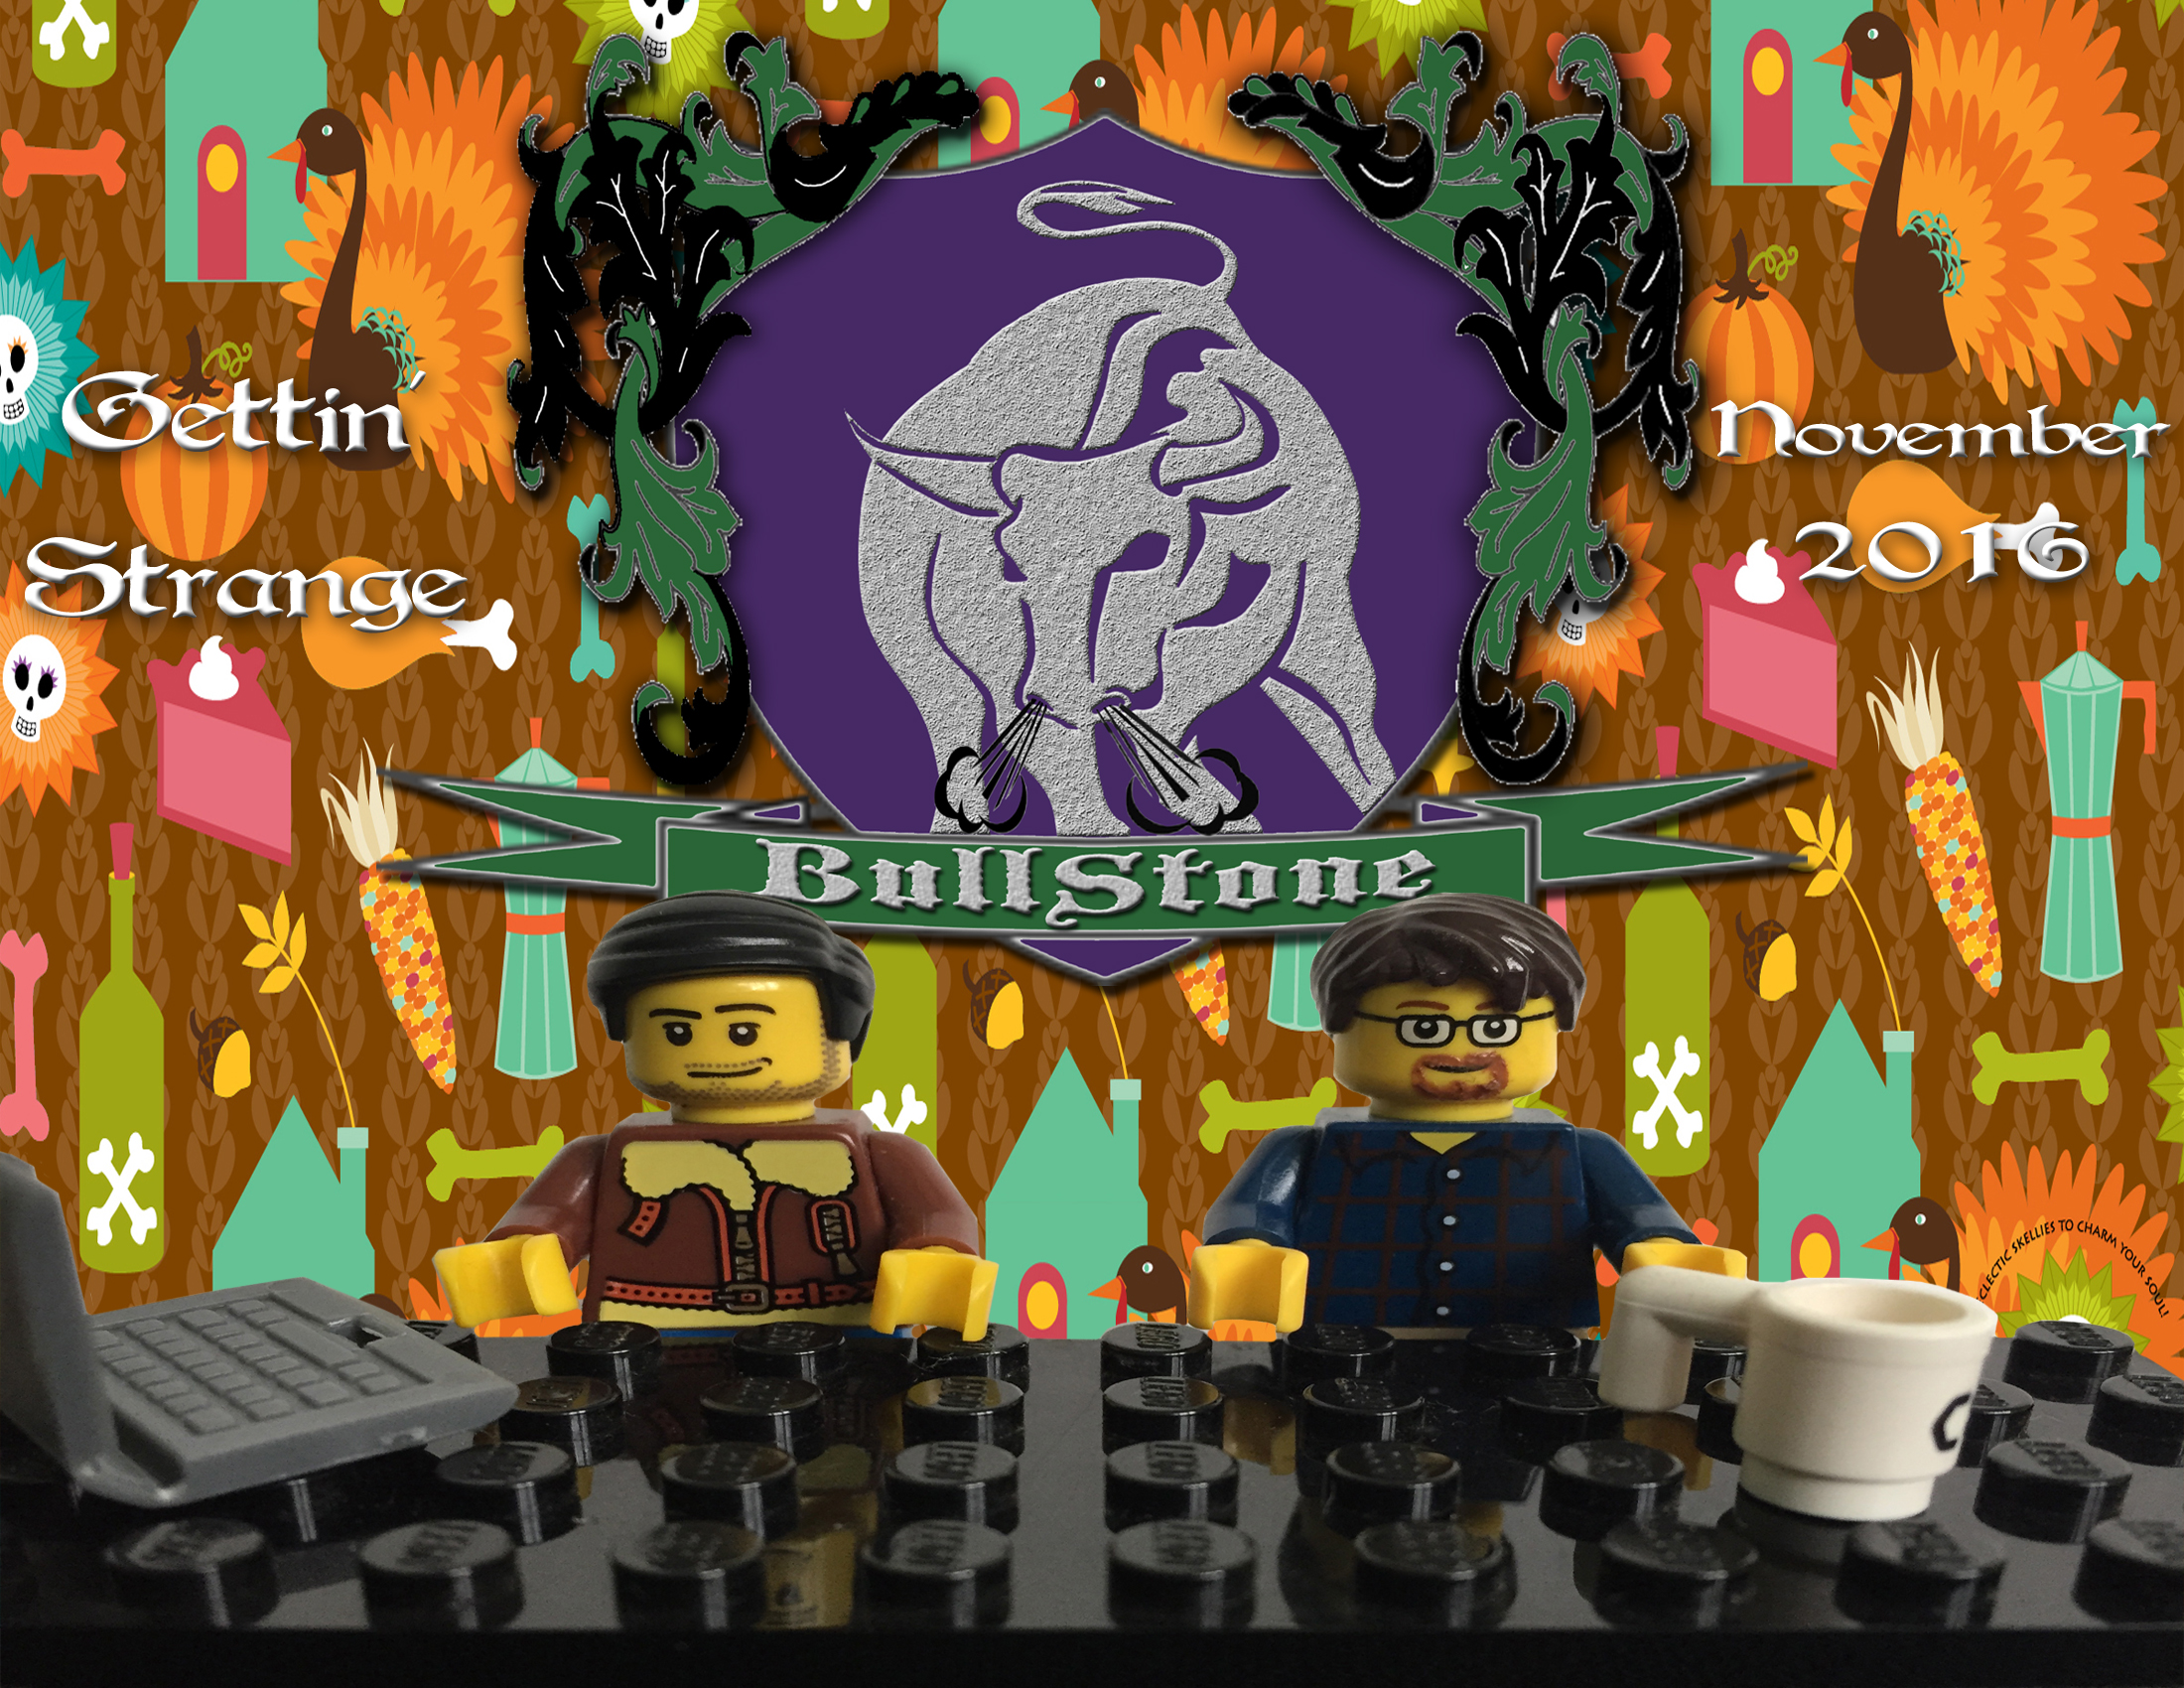 BullStone 22: Gettin' Strange, November 2016